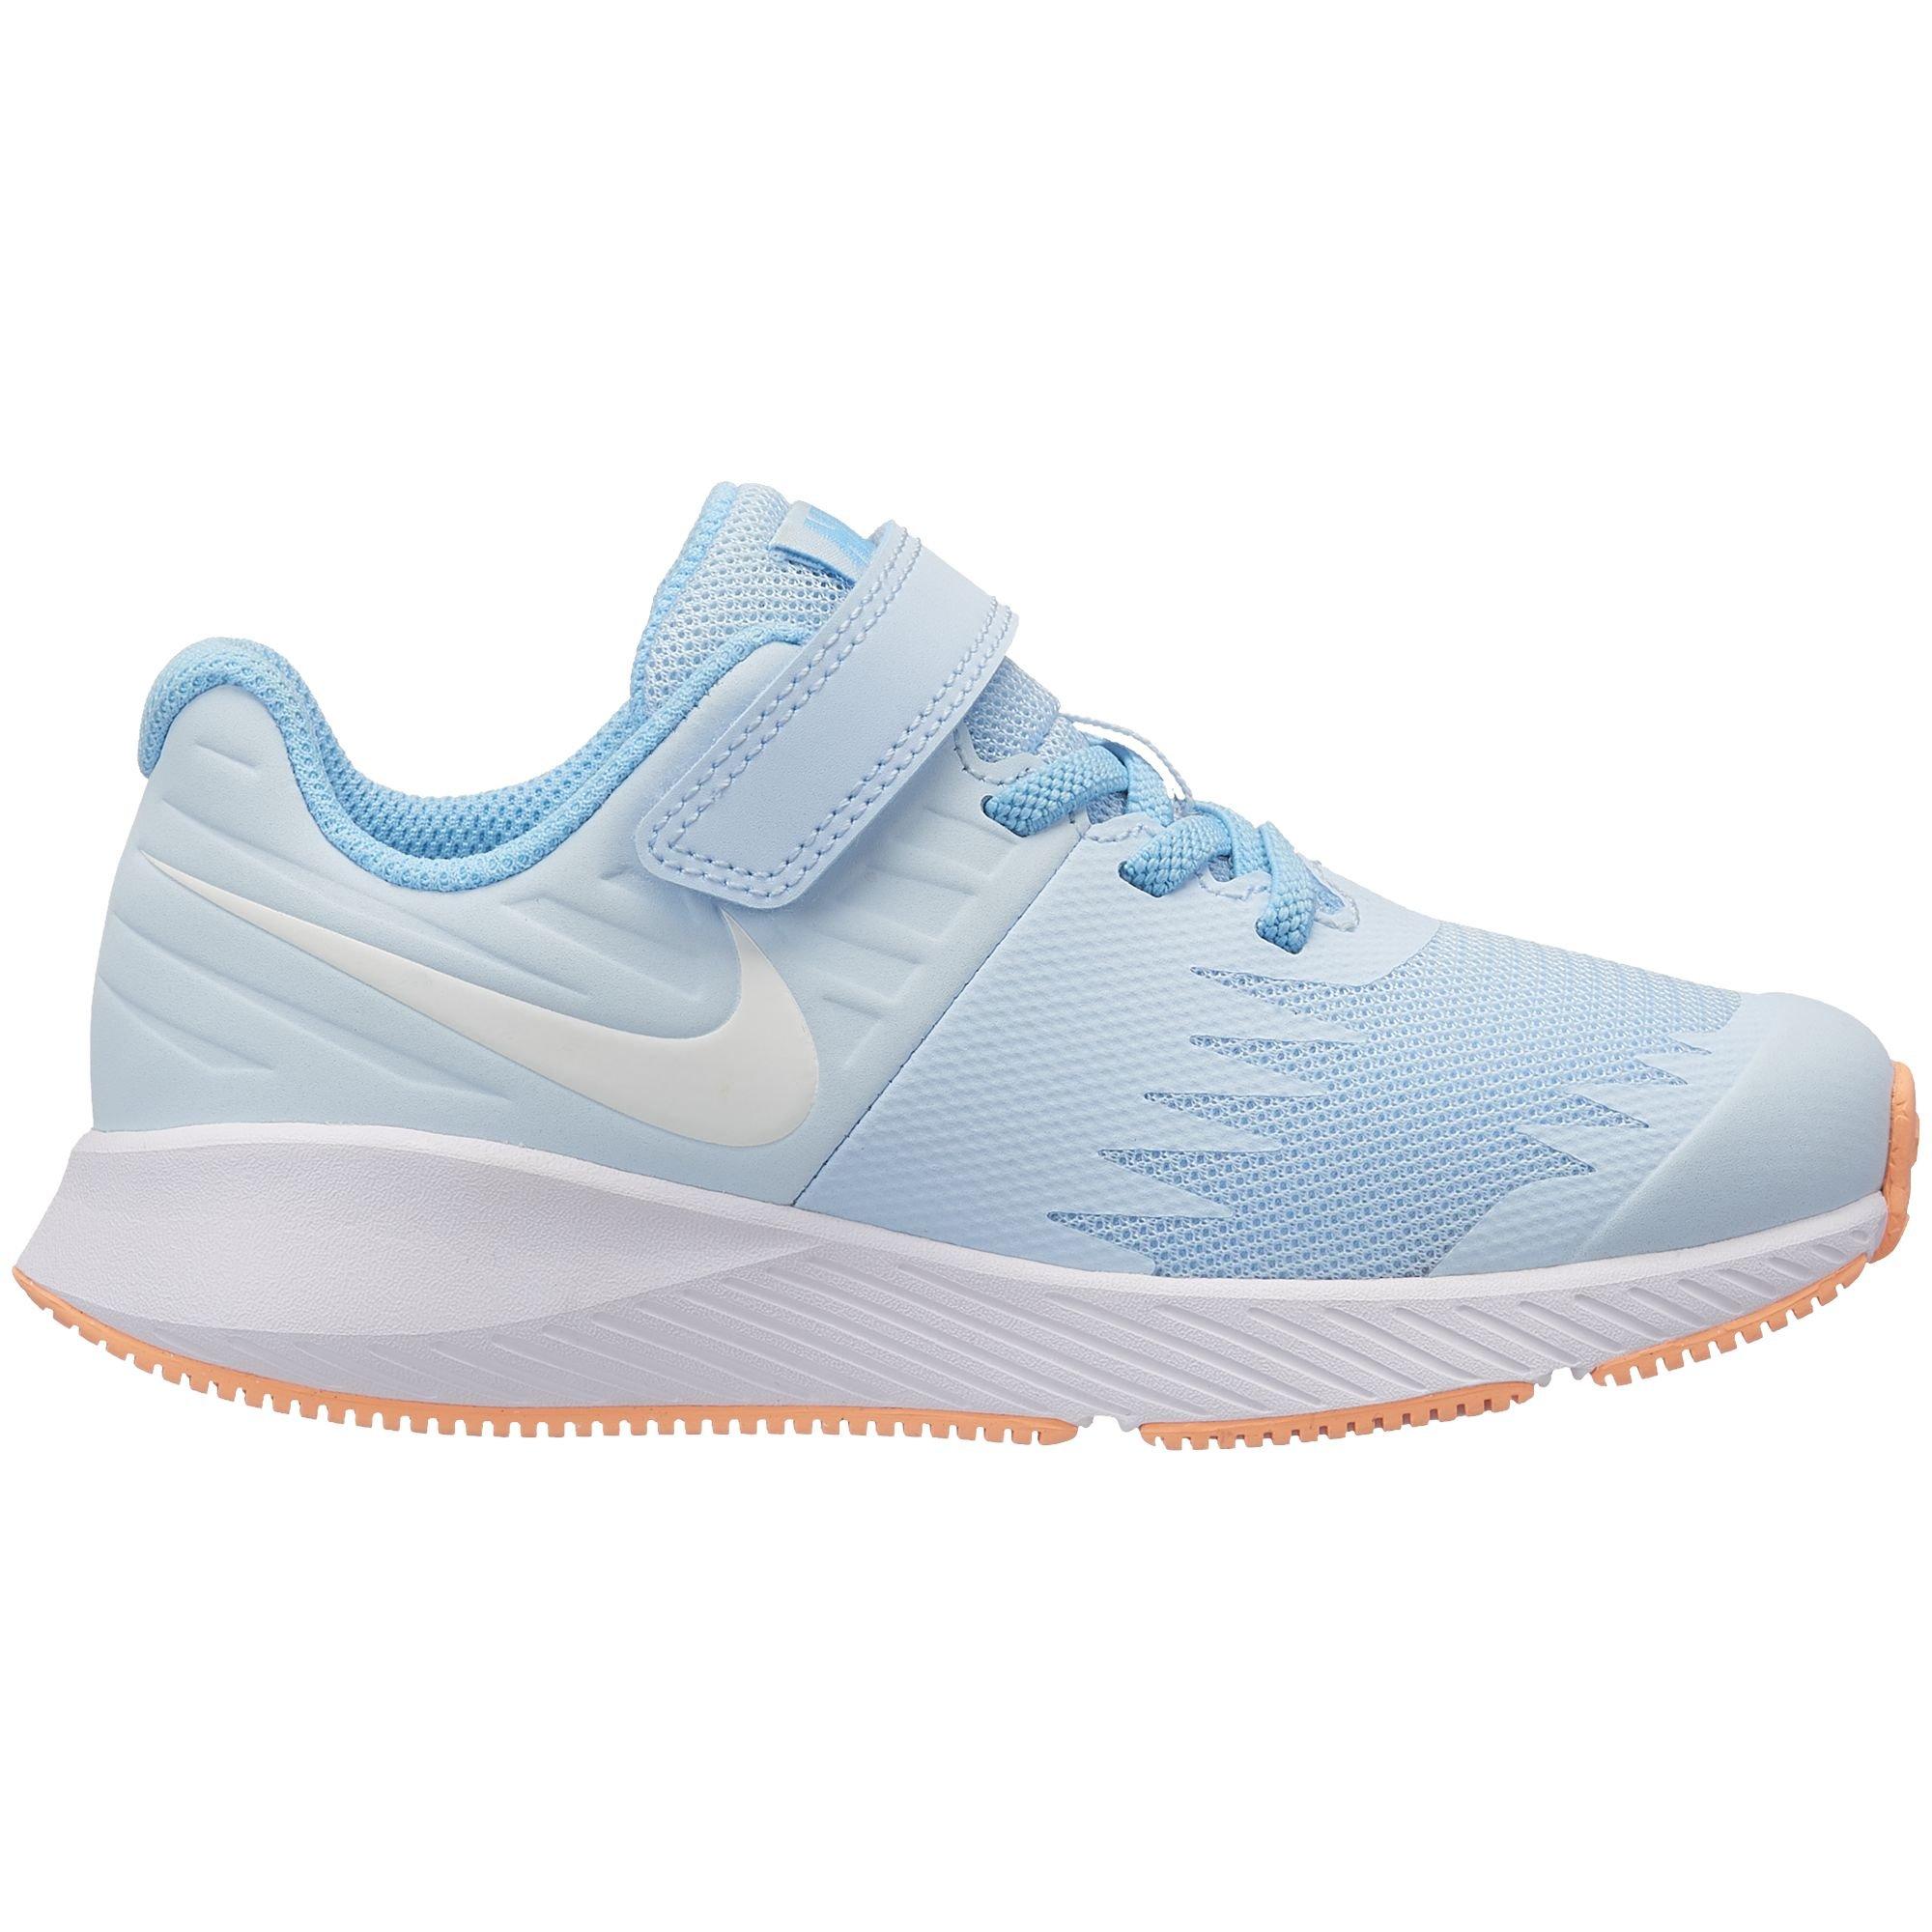 Nike Girl's Star Runner (PSV) Pre-School Shoe Cobalt Tint/White/Blue Chill Size 1 M US by Nike (Image #1)